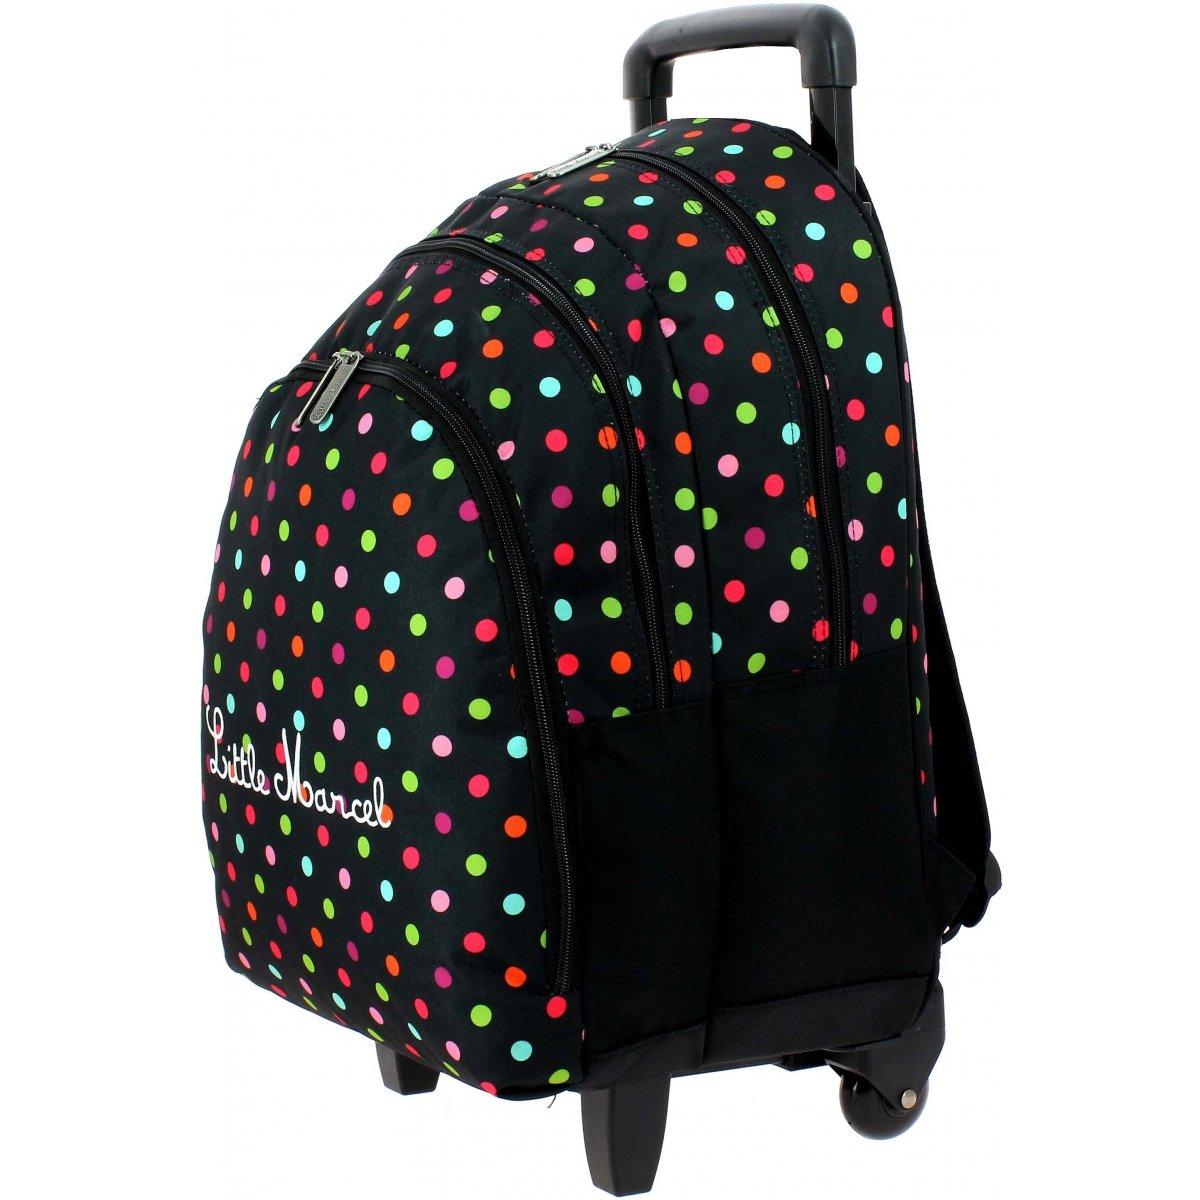 sac dos scolaire roulettes little marcel rimbau229. Black Bedroom Furniture Sets. Home Design Ideas